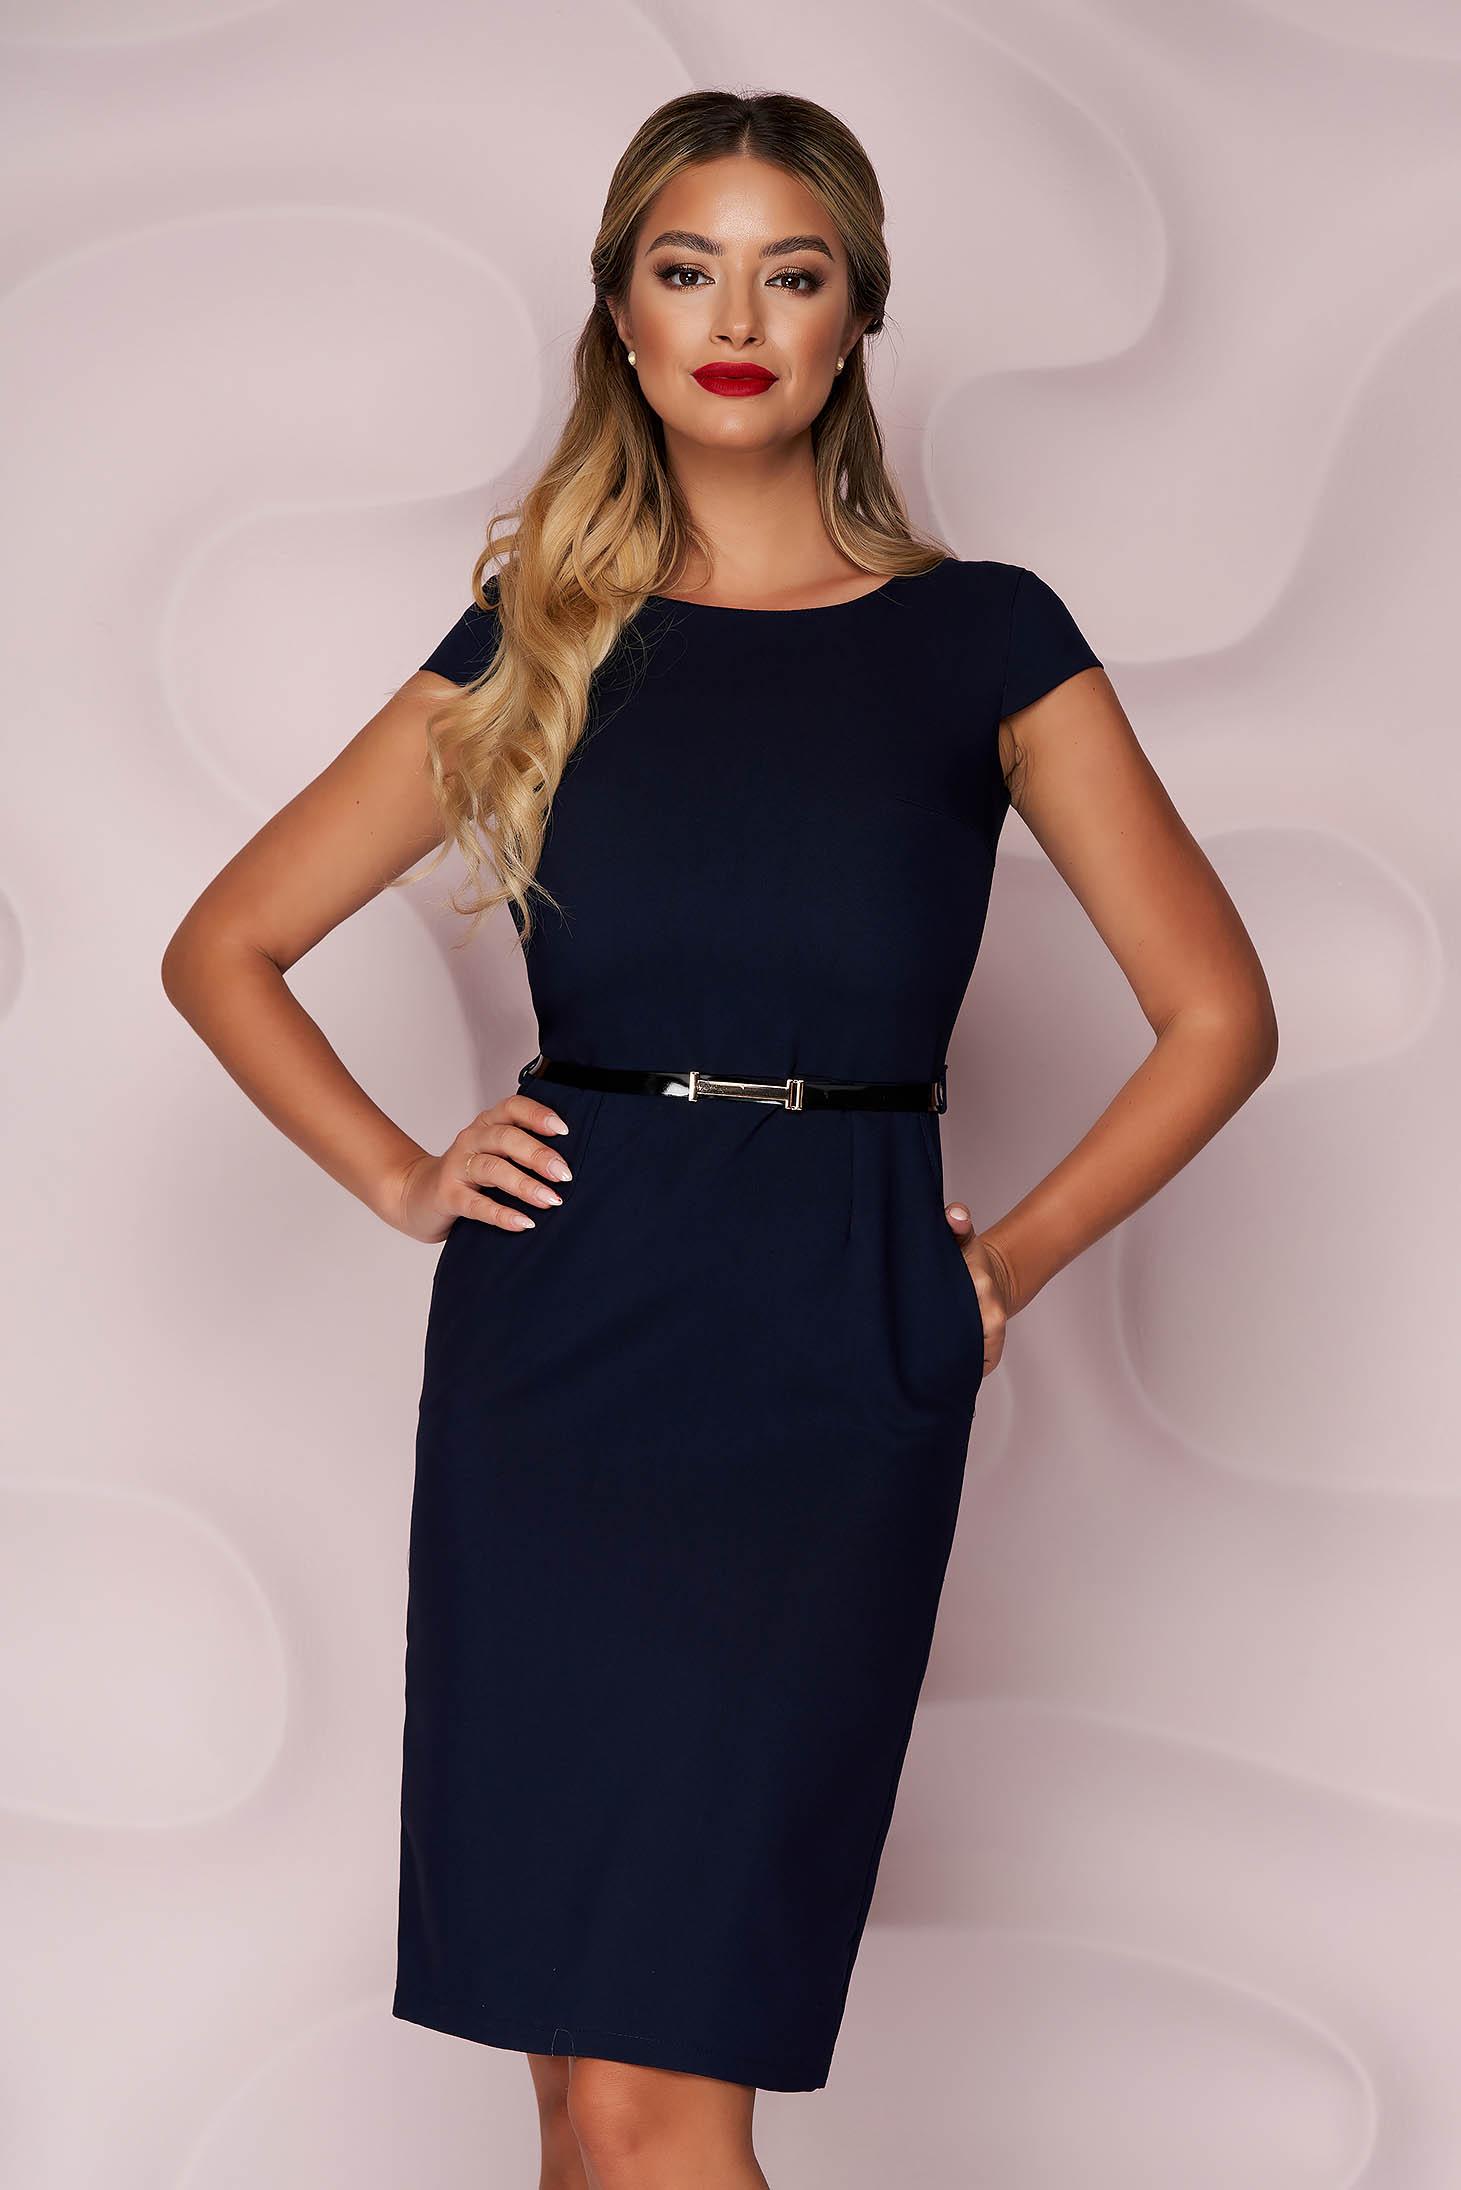 StarShinerS darkblue dress office midi pencil cloth thin fabric nonelastic fabric accessorized with belt